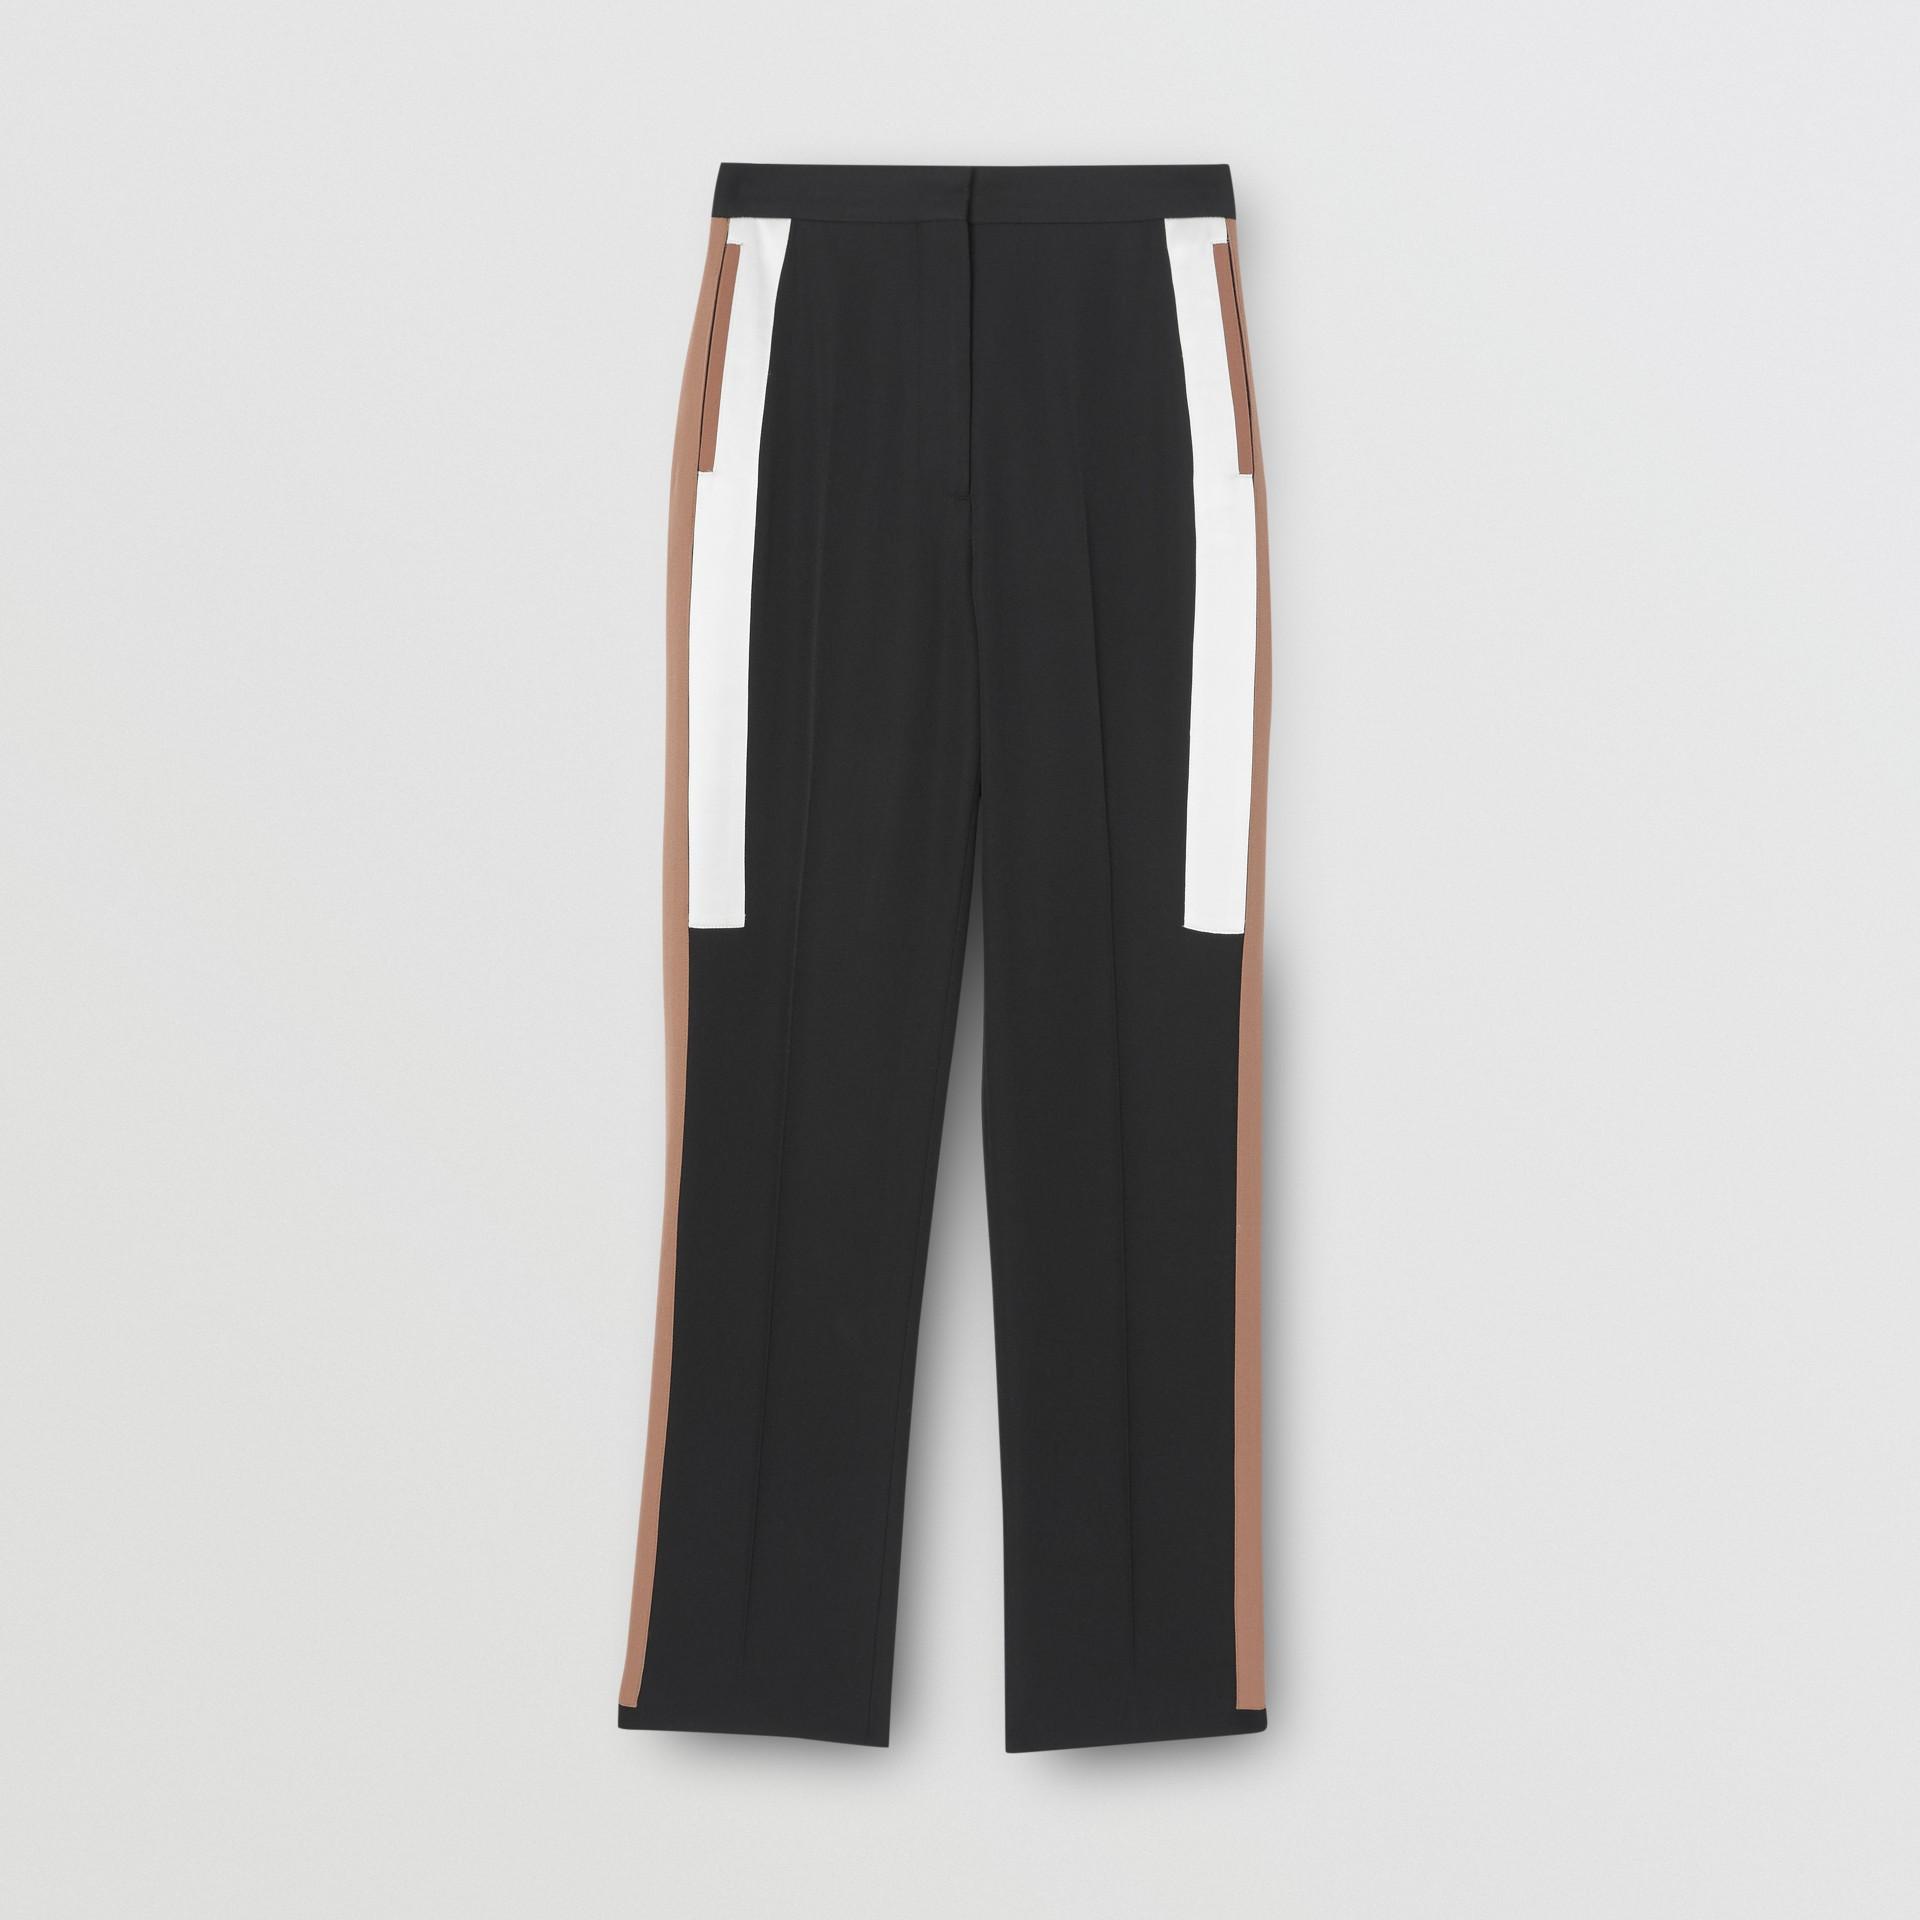 Stripe Detail Wool Tailored Trousers in Black - Women | Burberry United Kingdom - gallery image 3